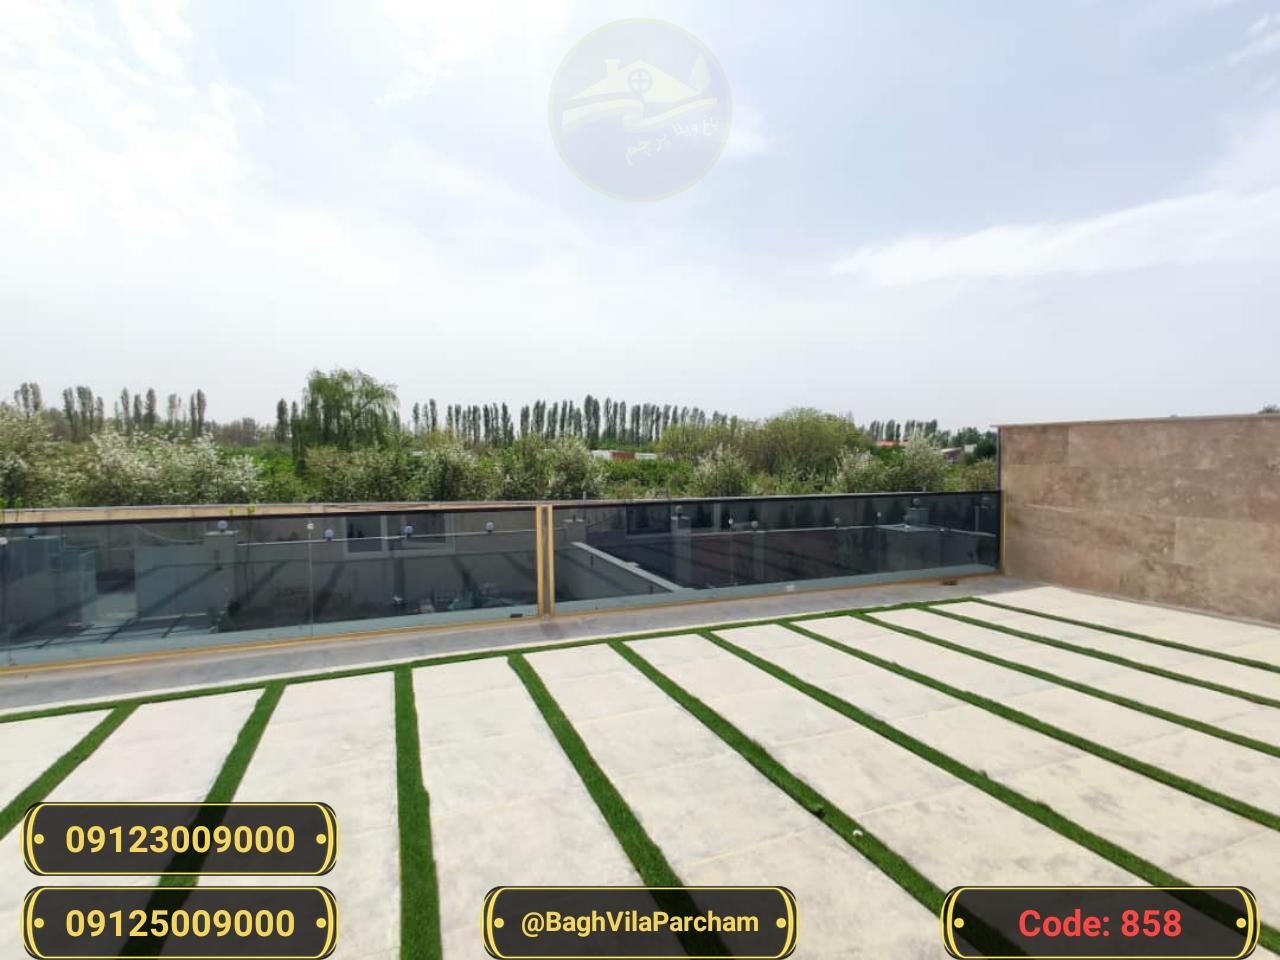 تصویر عکس باغ ویلا شماره 6 از ویلای ۵۰۰ متر ویلا دوبلکس مدرن Picture photo image 6 of ۵۰۰ متر ویلا دوبلکس مدرن